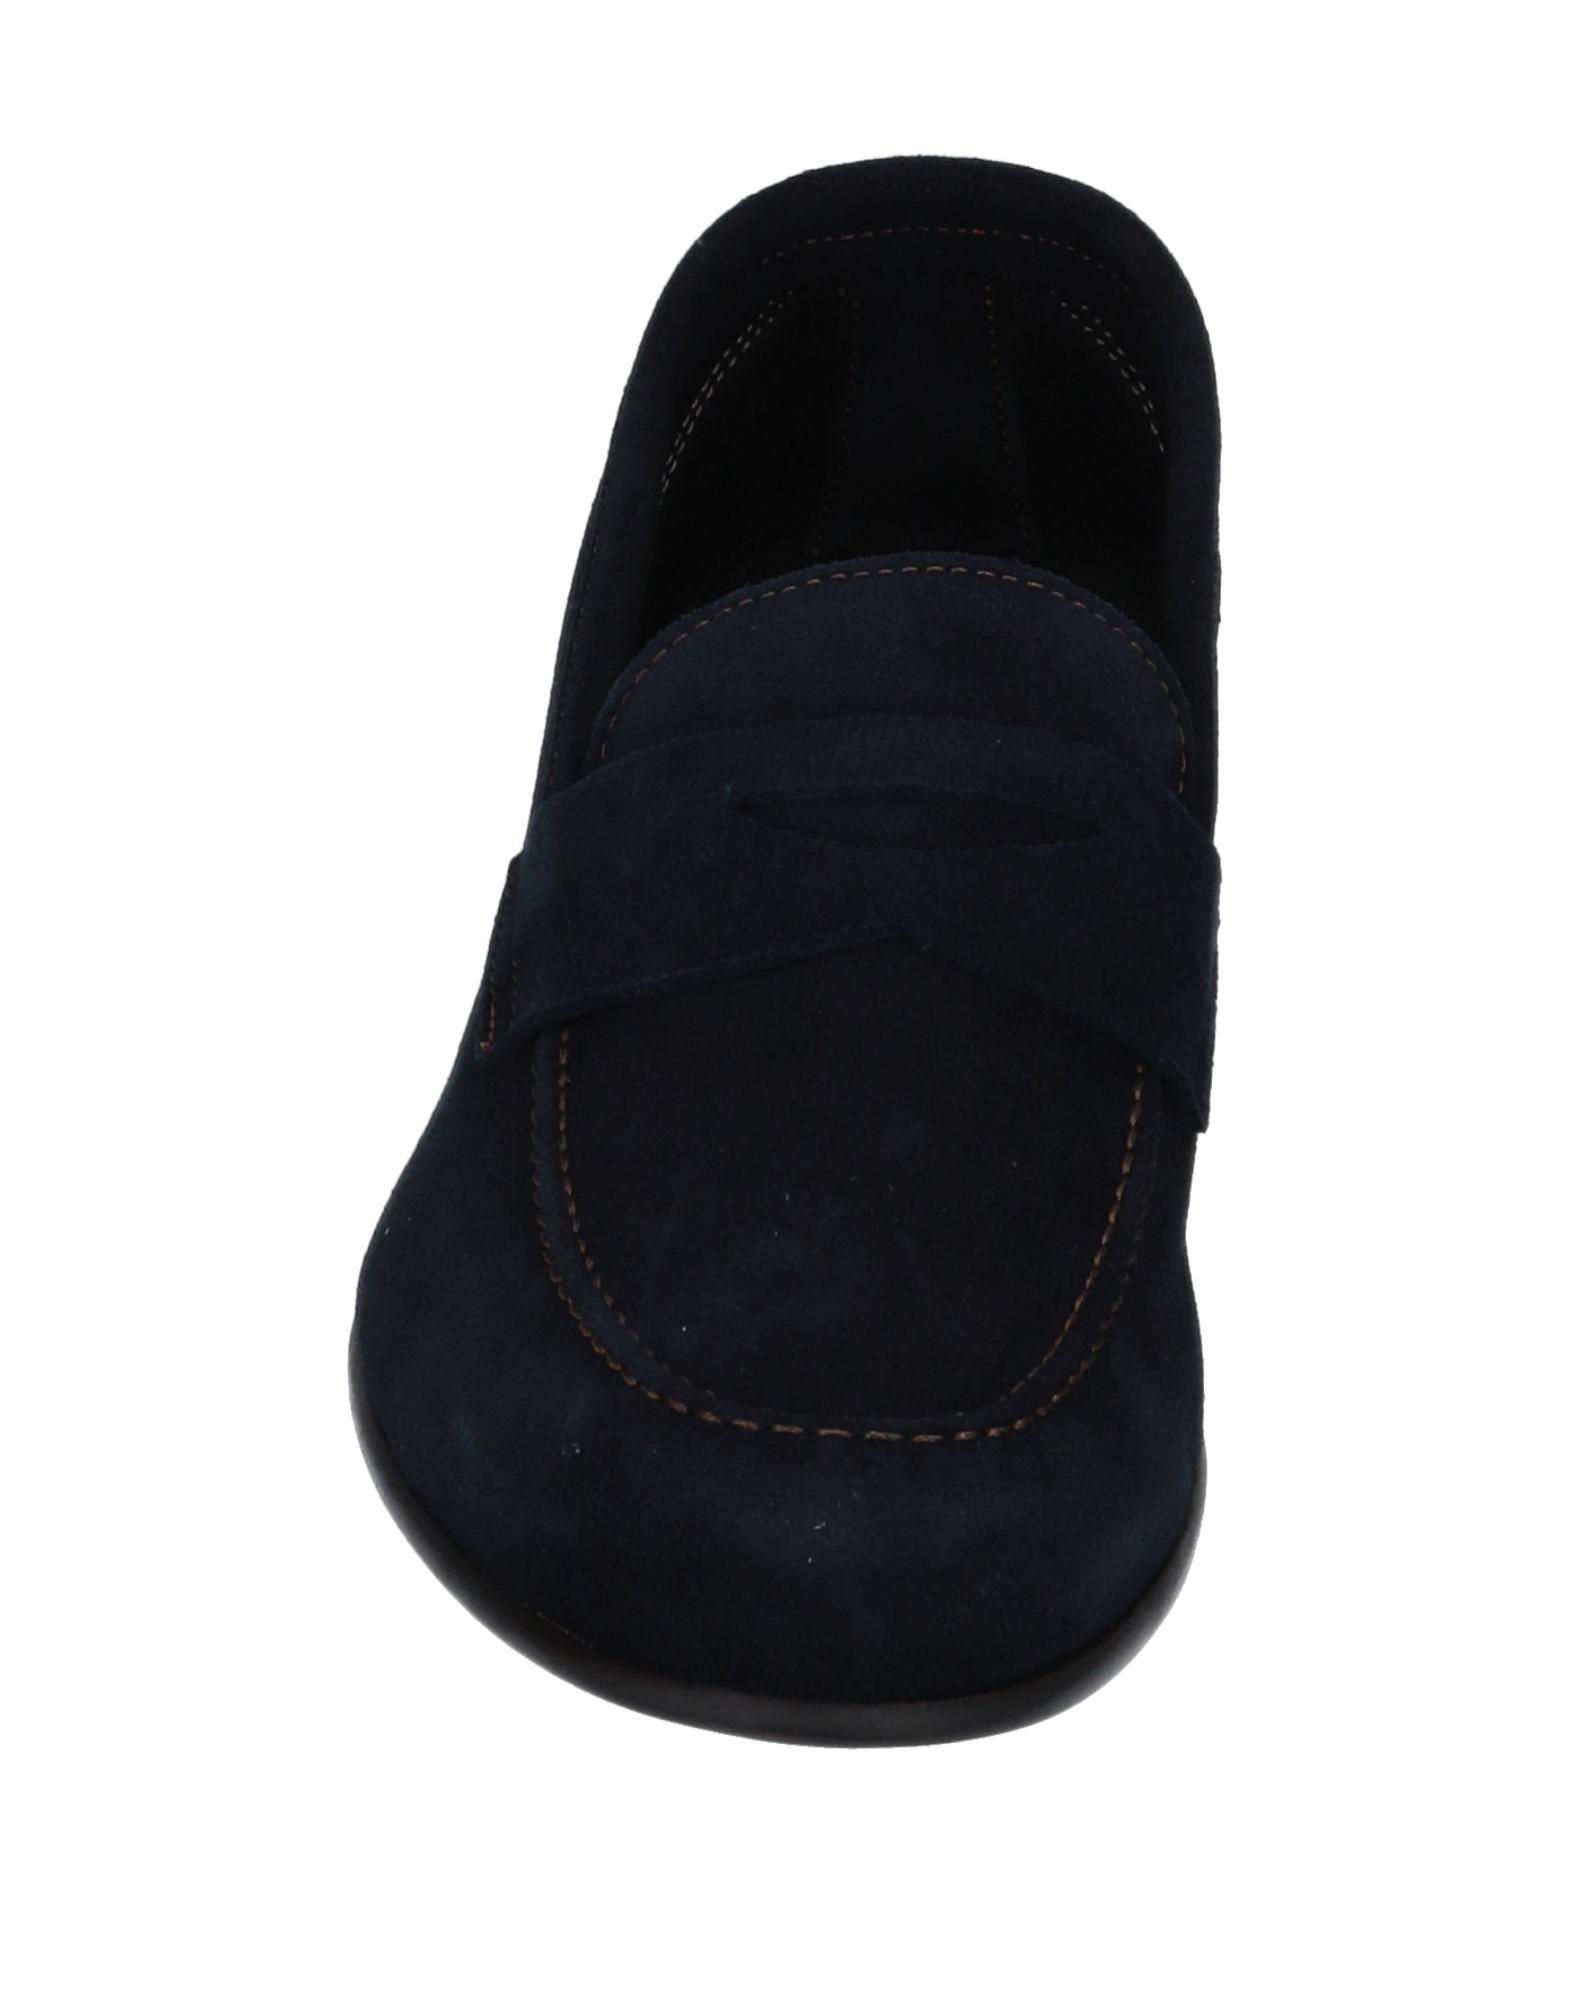 Baldinini Mokassins Herren beliebte  11554830PC Gute Qualität beliebte Herren Schuhe 2a762d